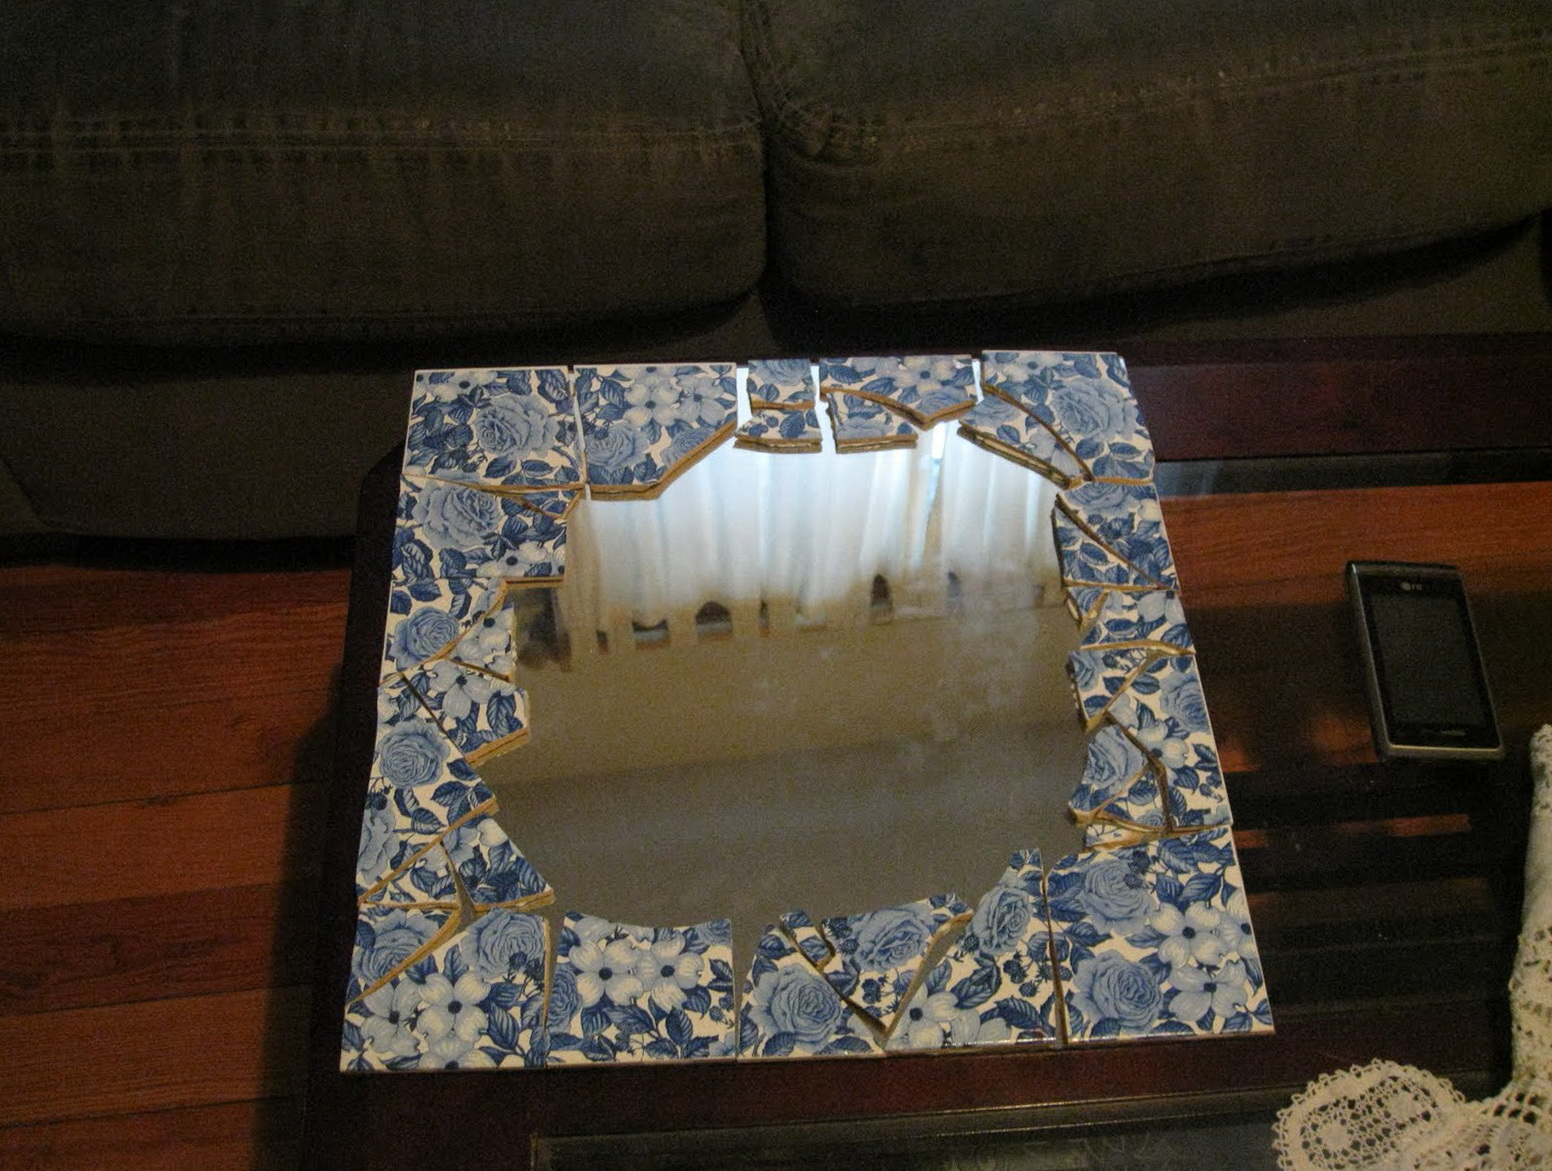 Broken Mirror Mosaic Tiles